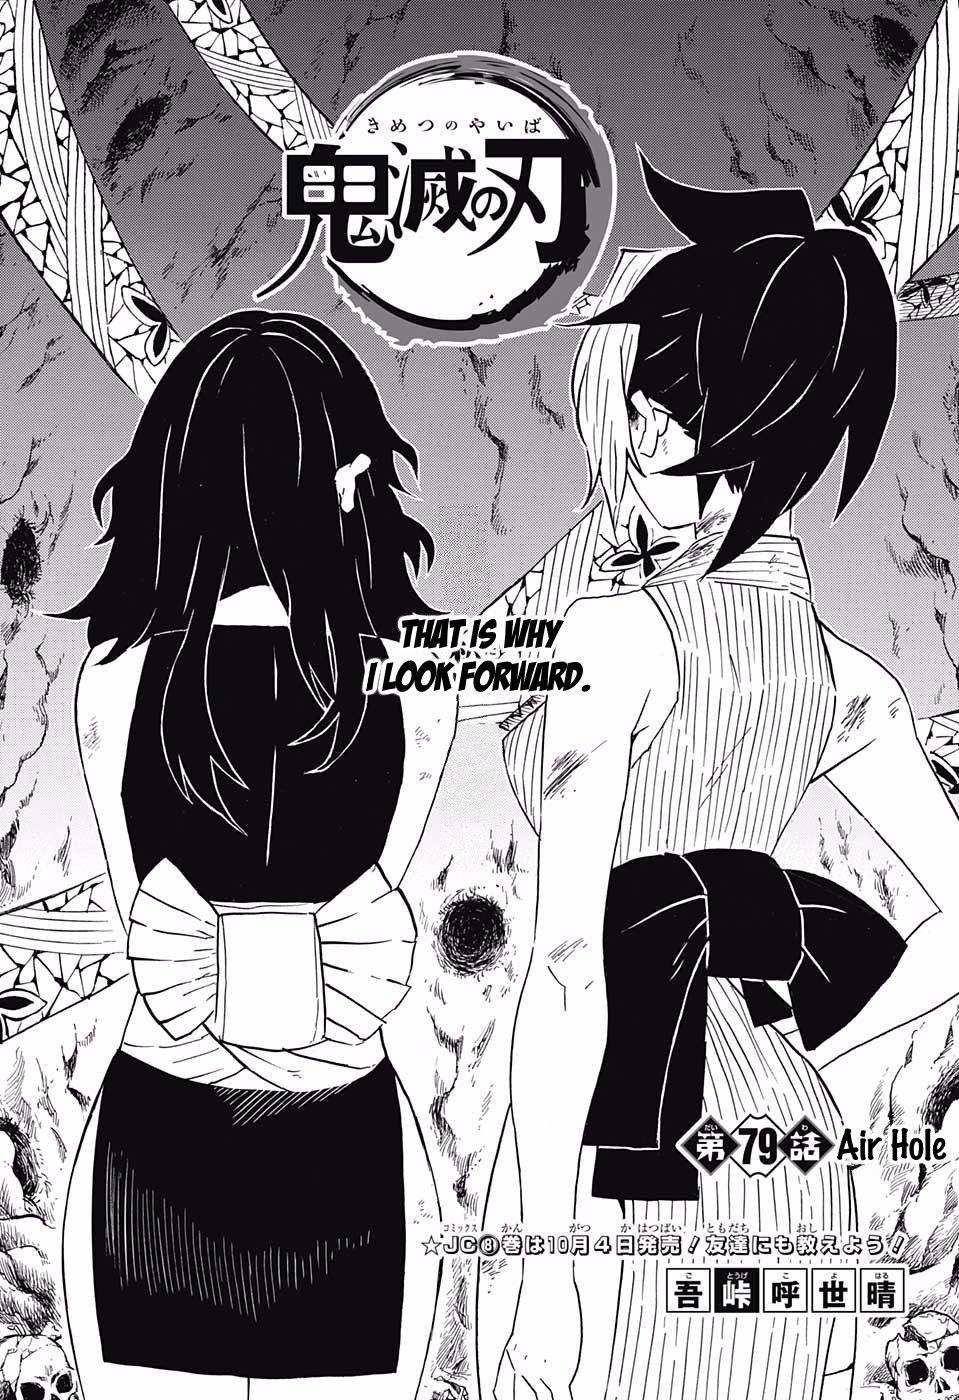 Kimetsu no Yaiba: Chapter 79: Air Hole - 第1页